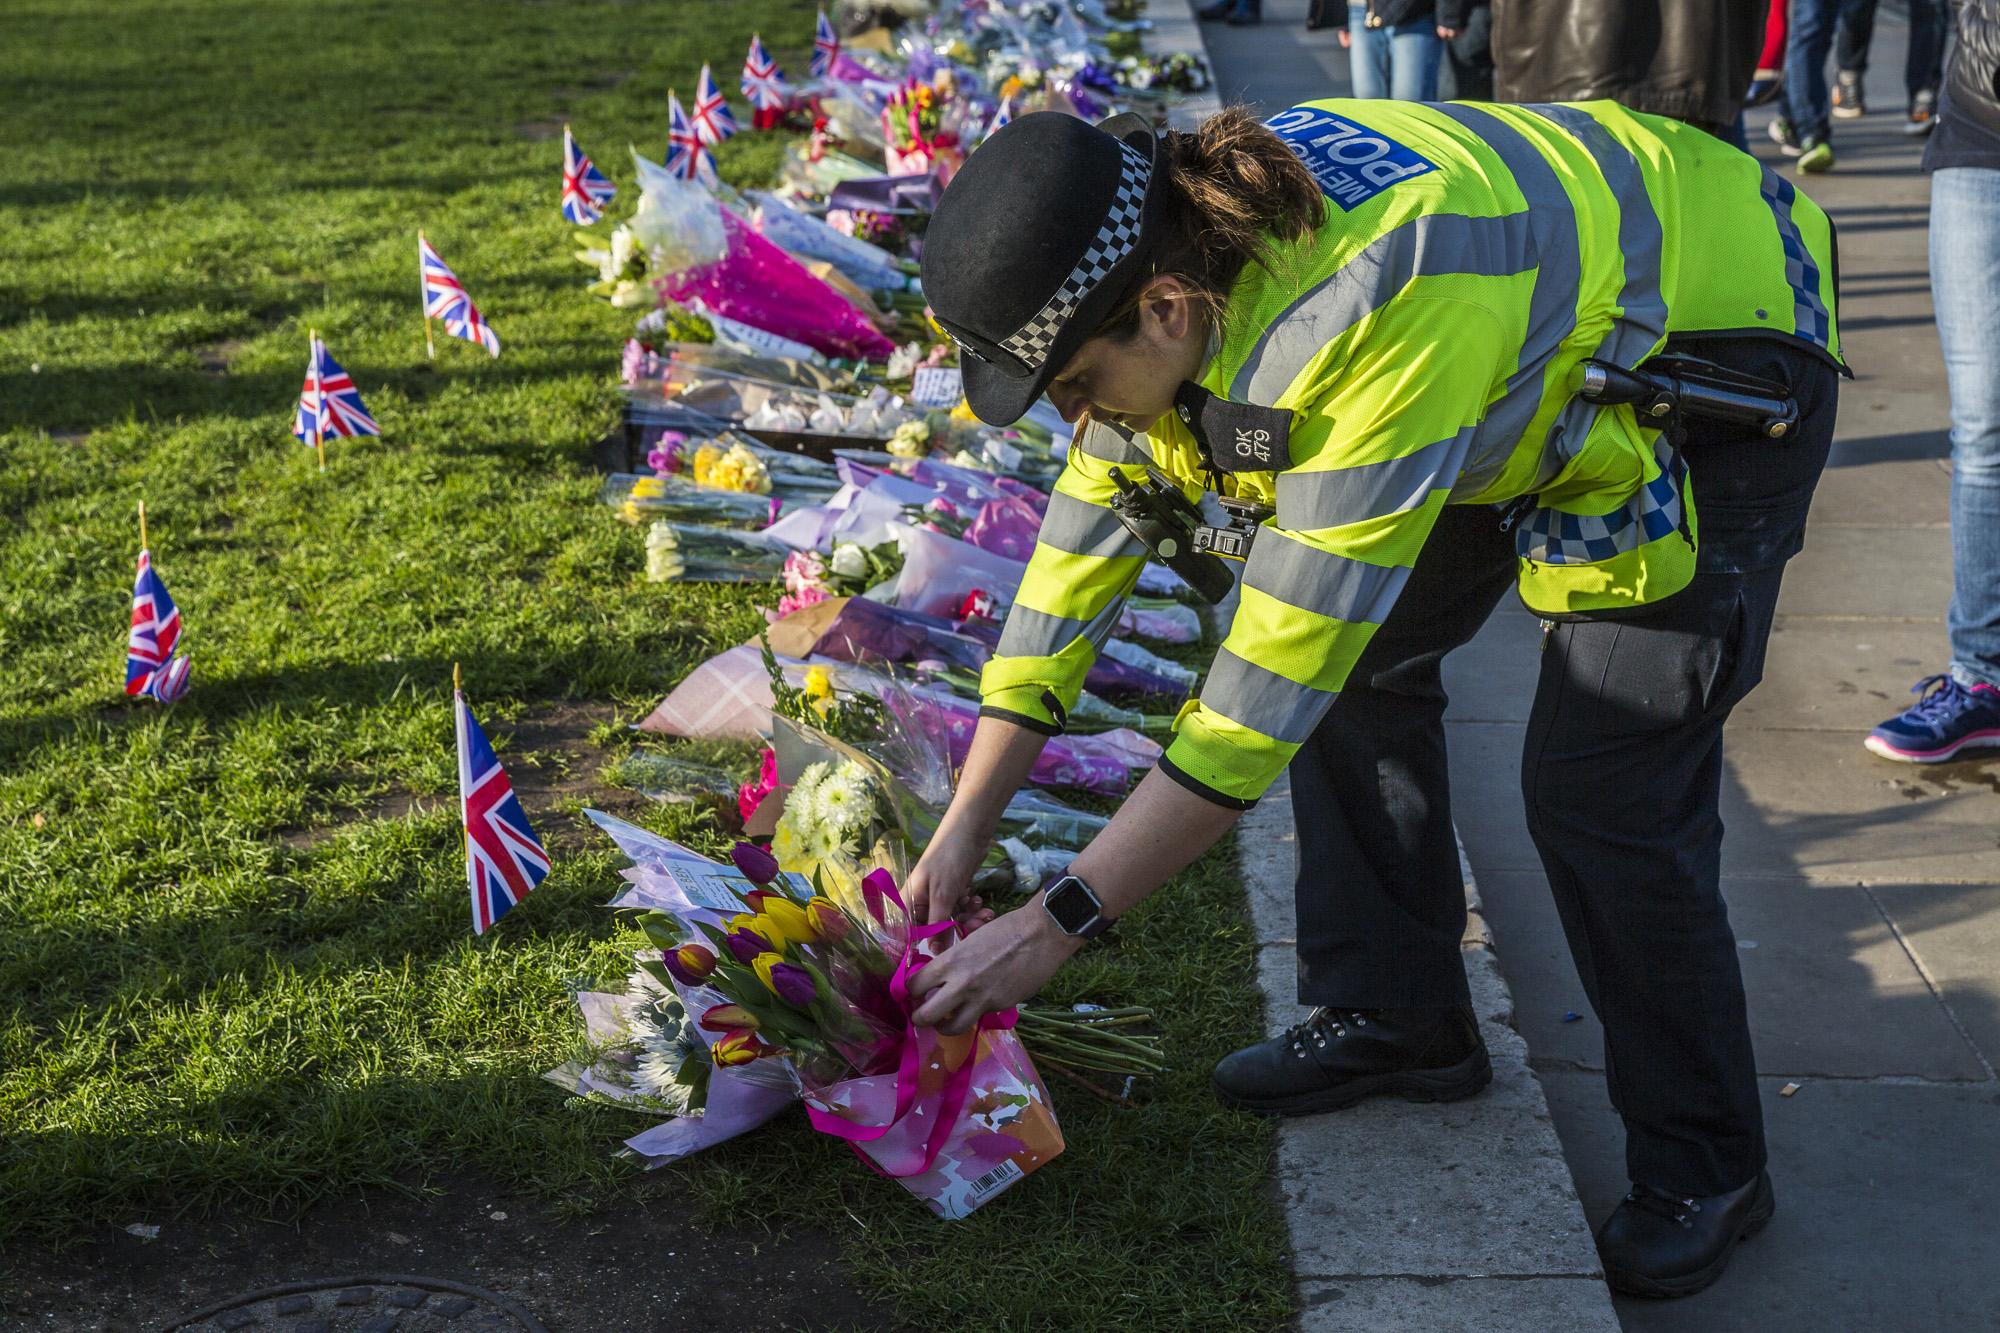 London_Attack_Hope_Not_Hate-49.jpg